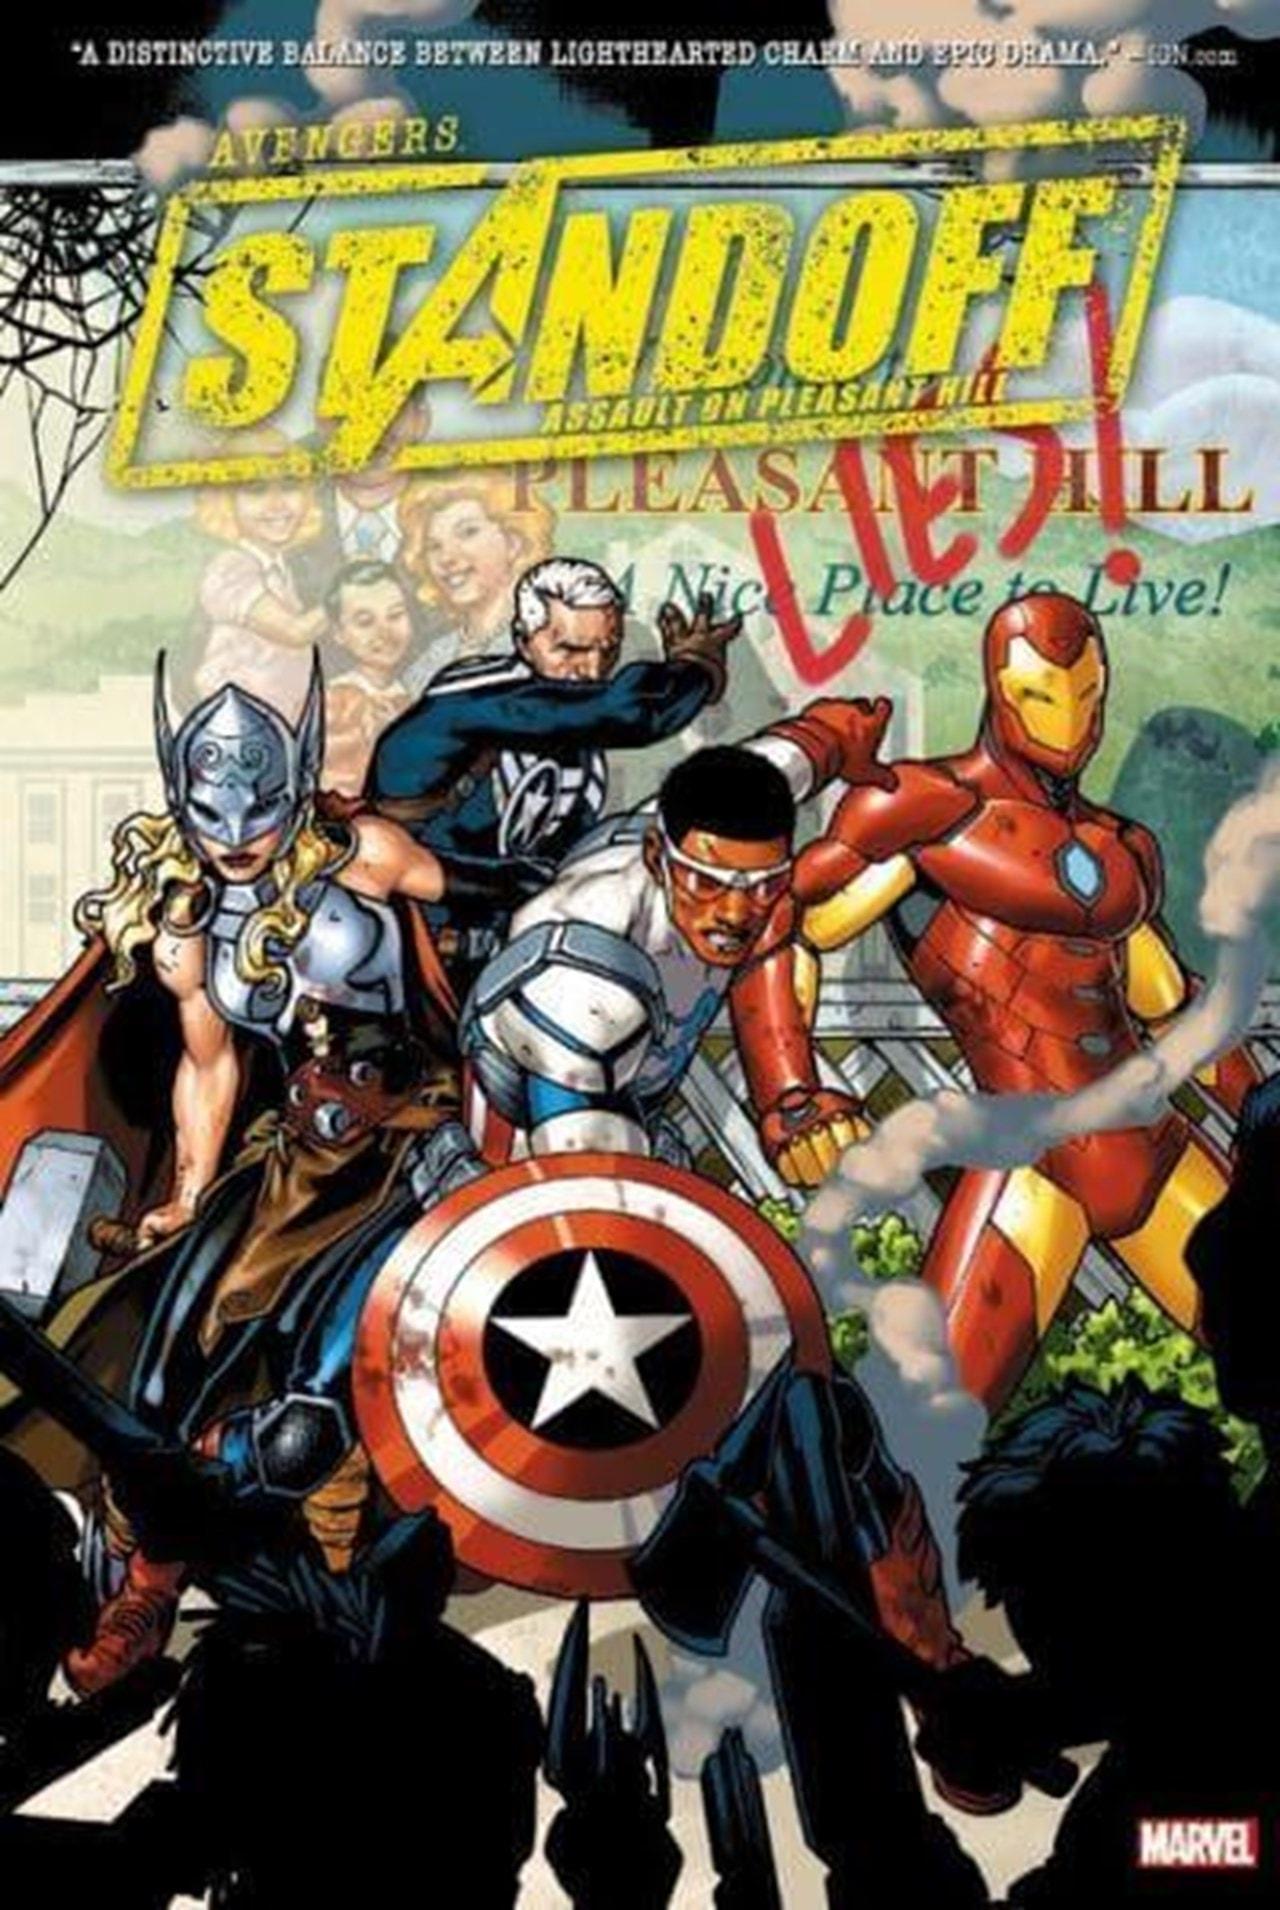 Avengers: Standoff - 1